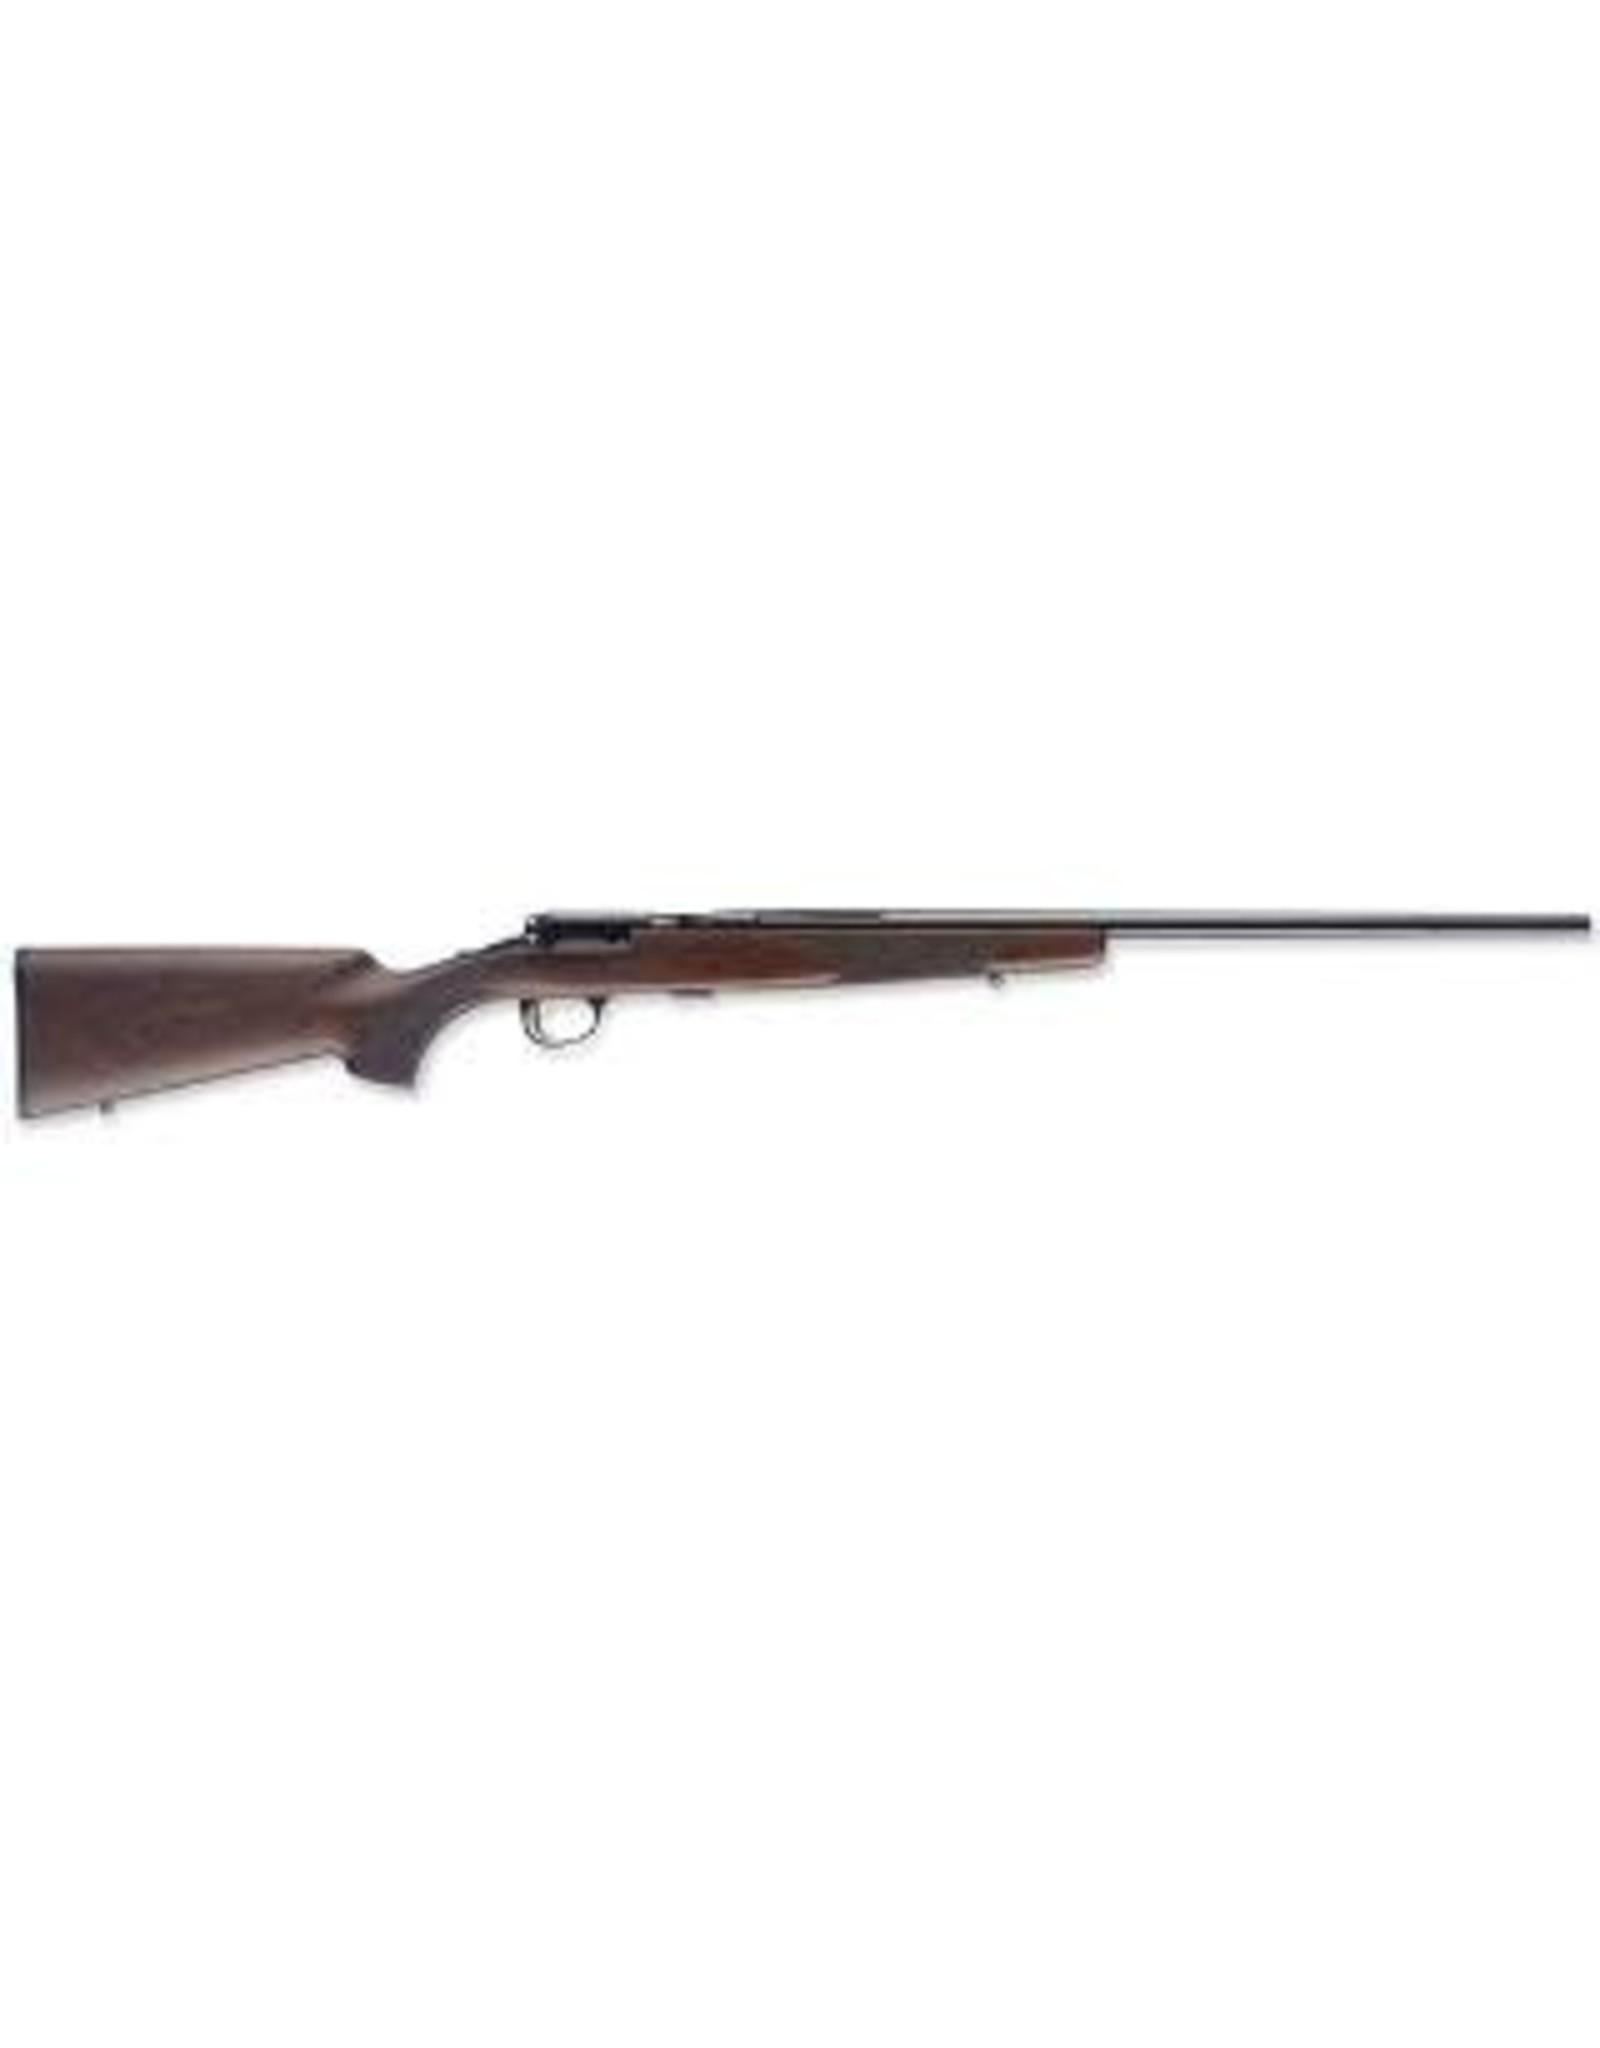 "Browning Browning T-Bolt Target/Varmint .22 LR 10+1 Round 22"" bbl"